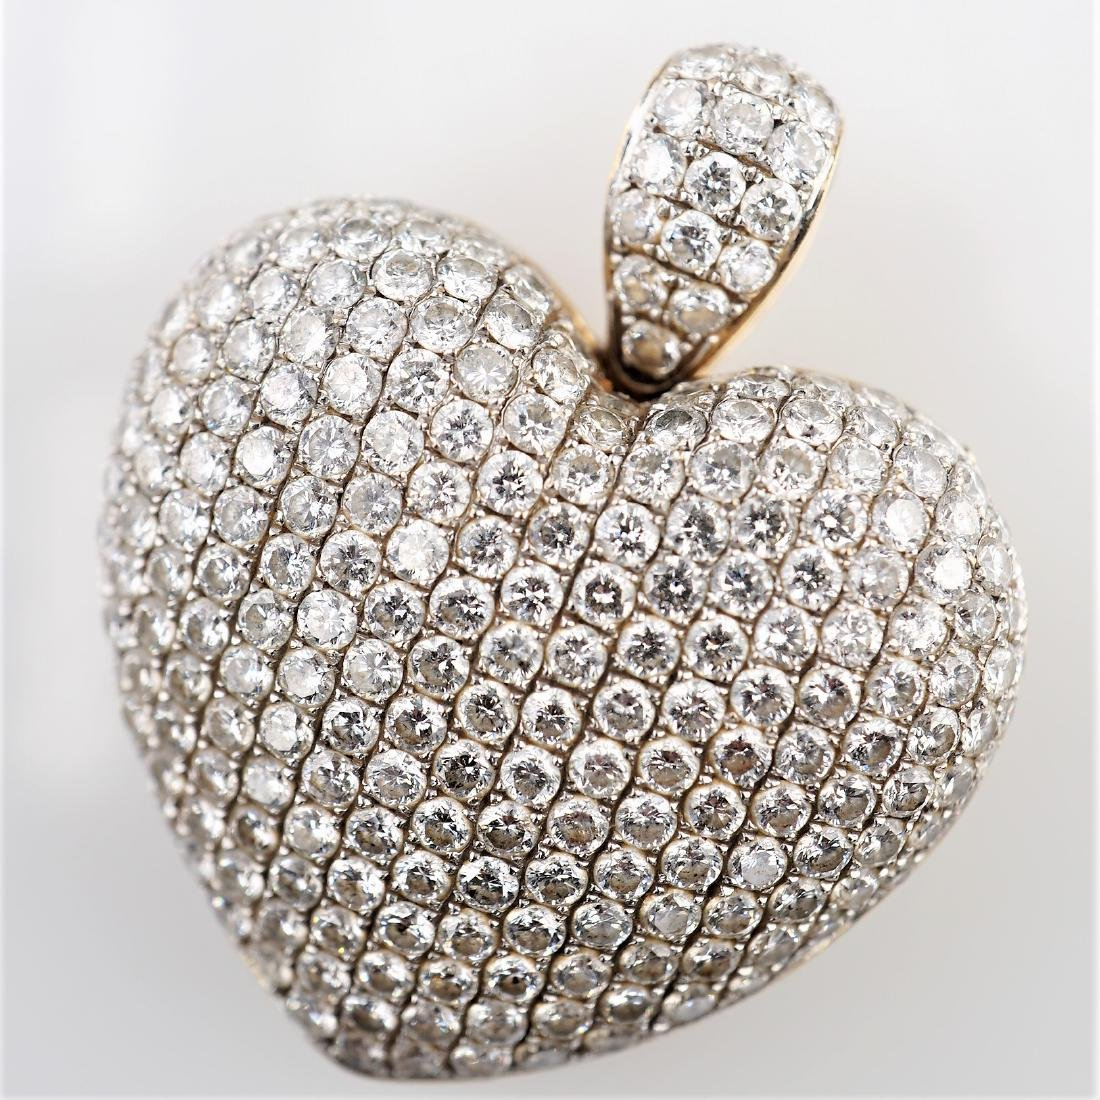 3 CTTW White Diamond Pendant in YG